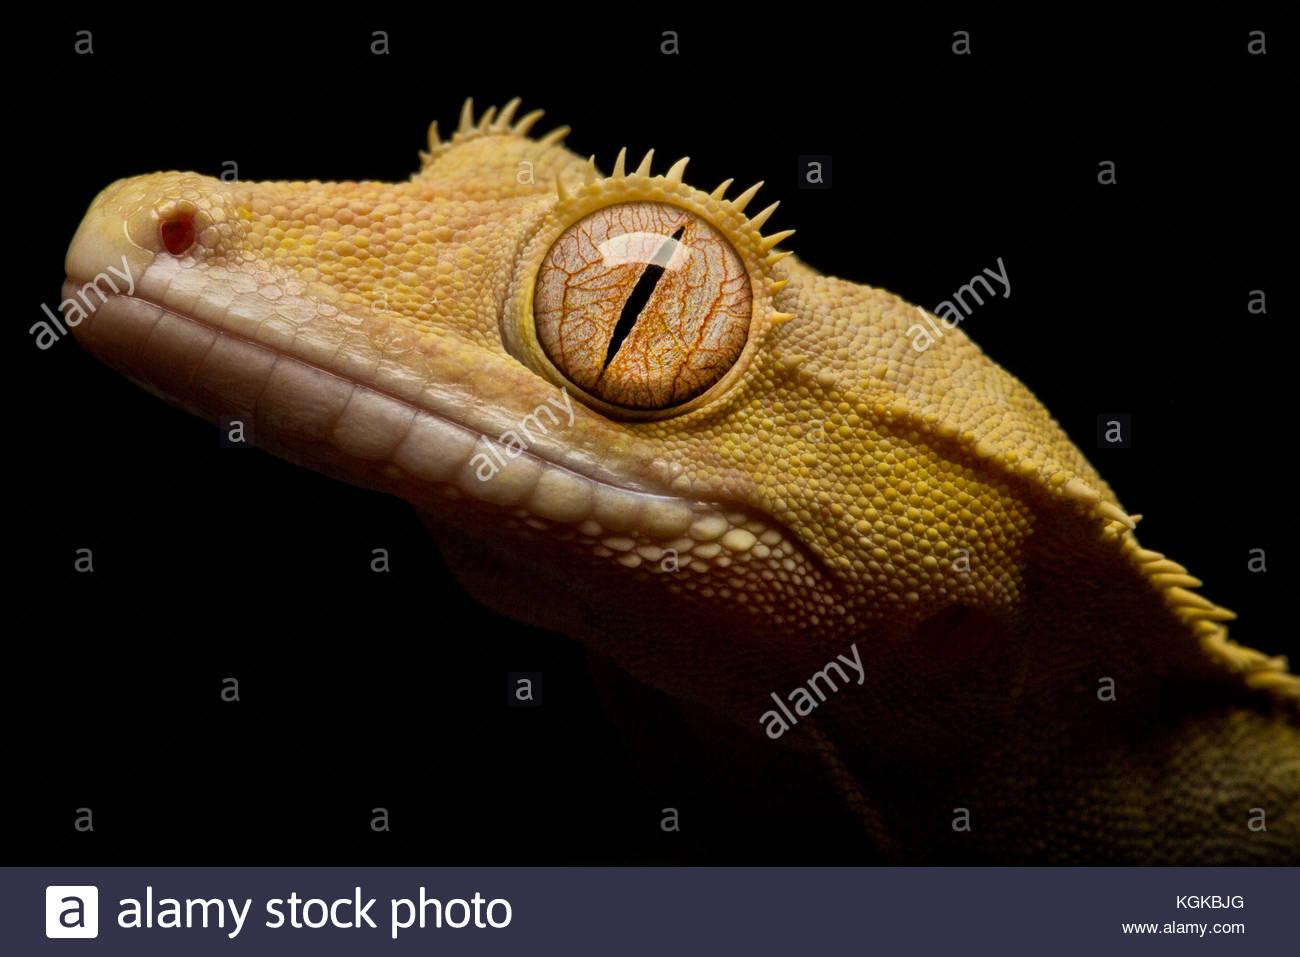 Nahaufnahme, Porträt einer Crested Gecko, ciliatus Correlophus. Stockbild